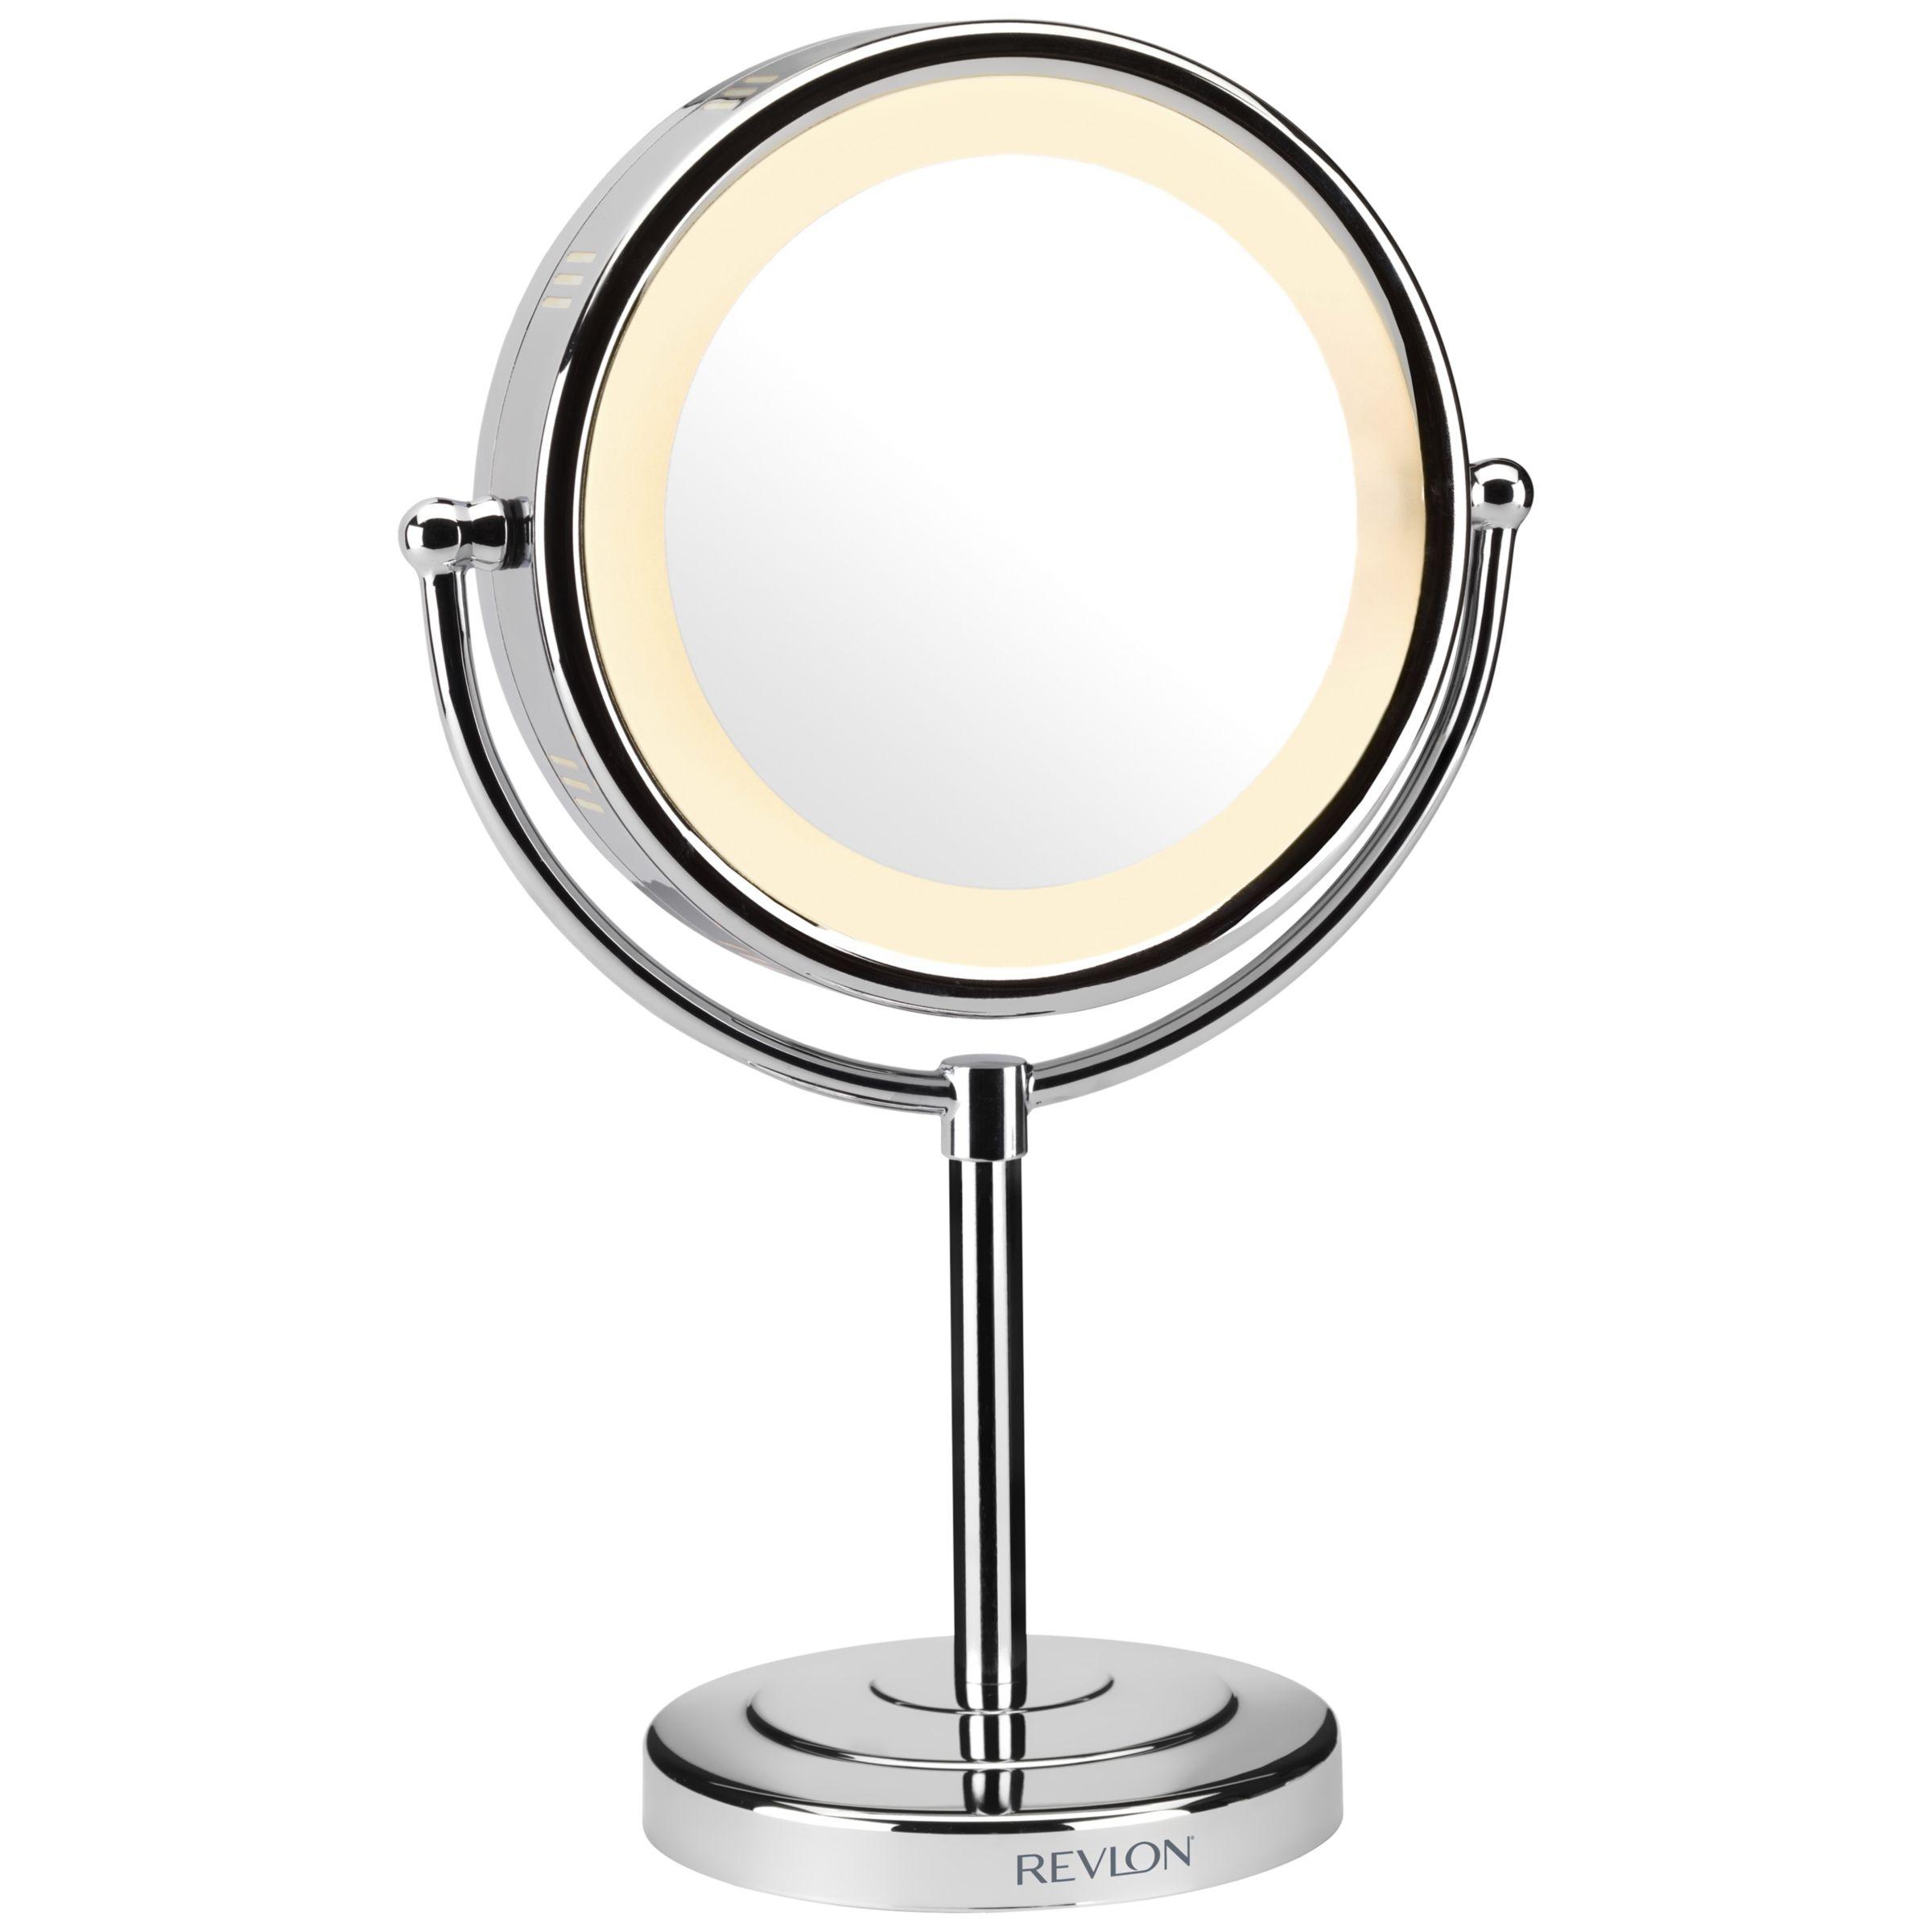 Revlon 9429u Luxury Illuminated Mirror, How To Replace Bulb In Revlon Makeup Mirror